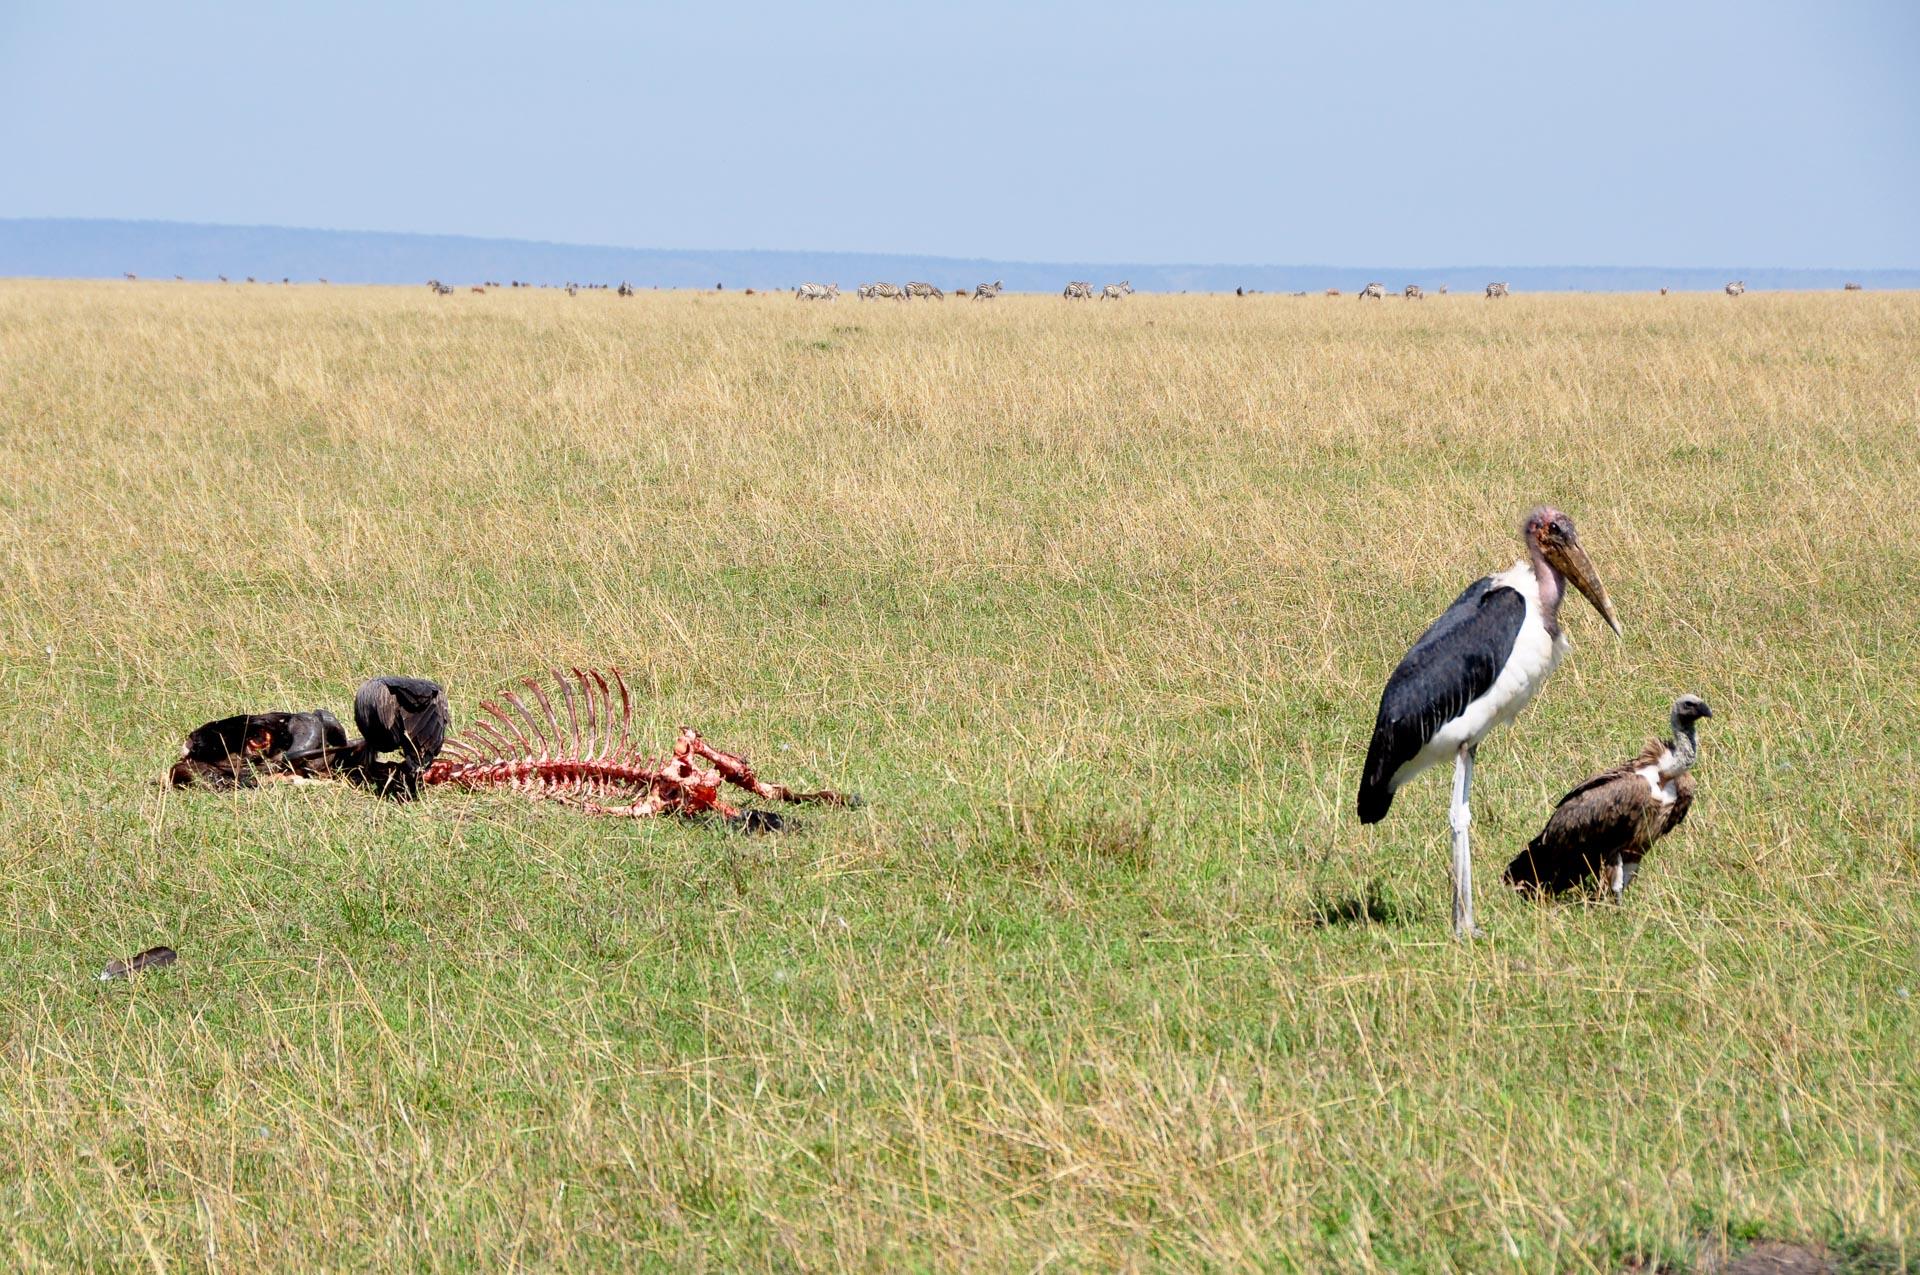 Masai-Mara-Kenia-Globetrotter-Select-12